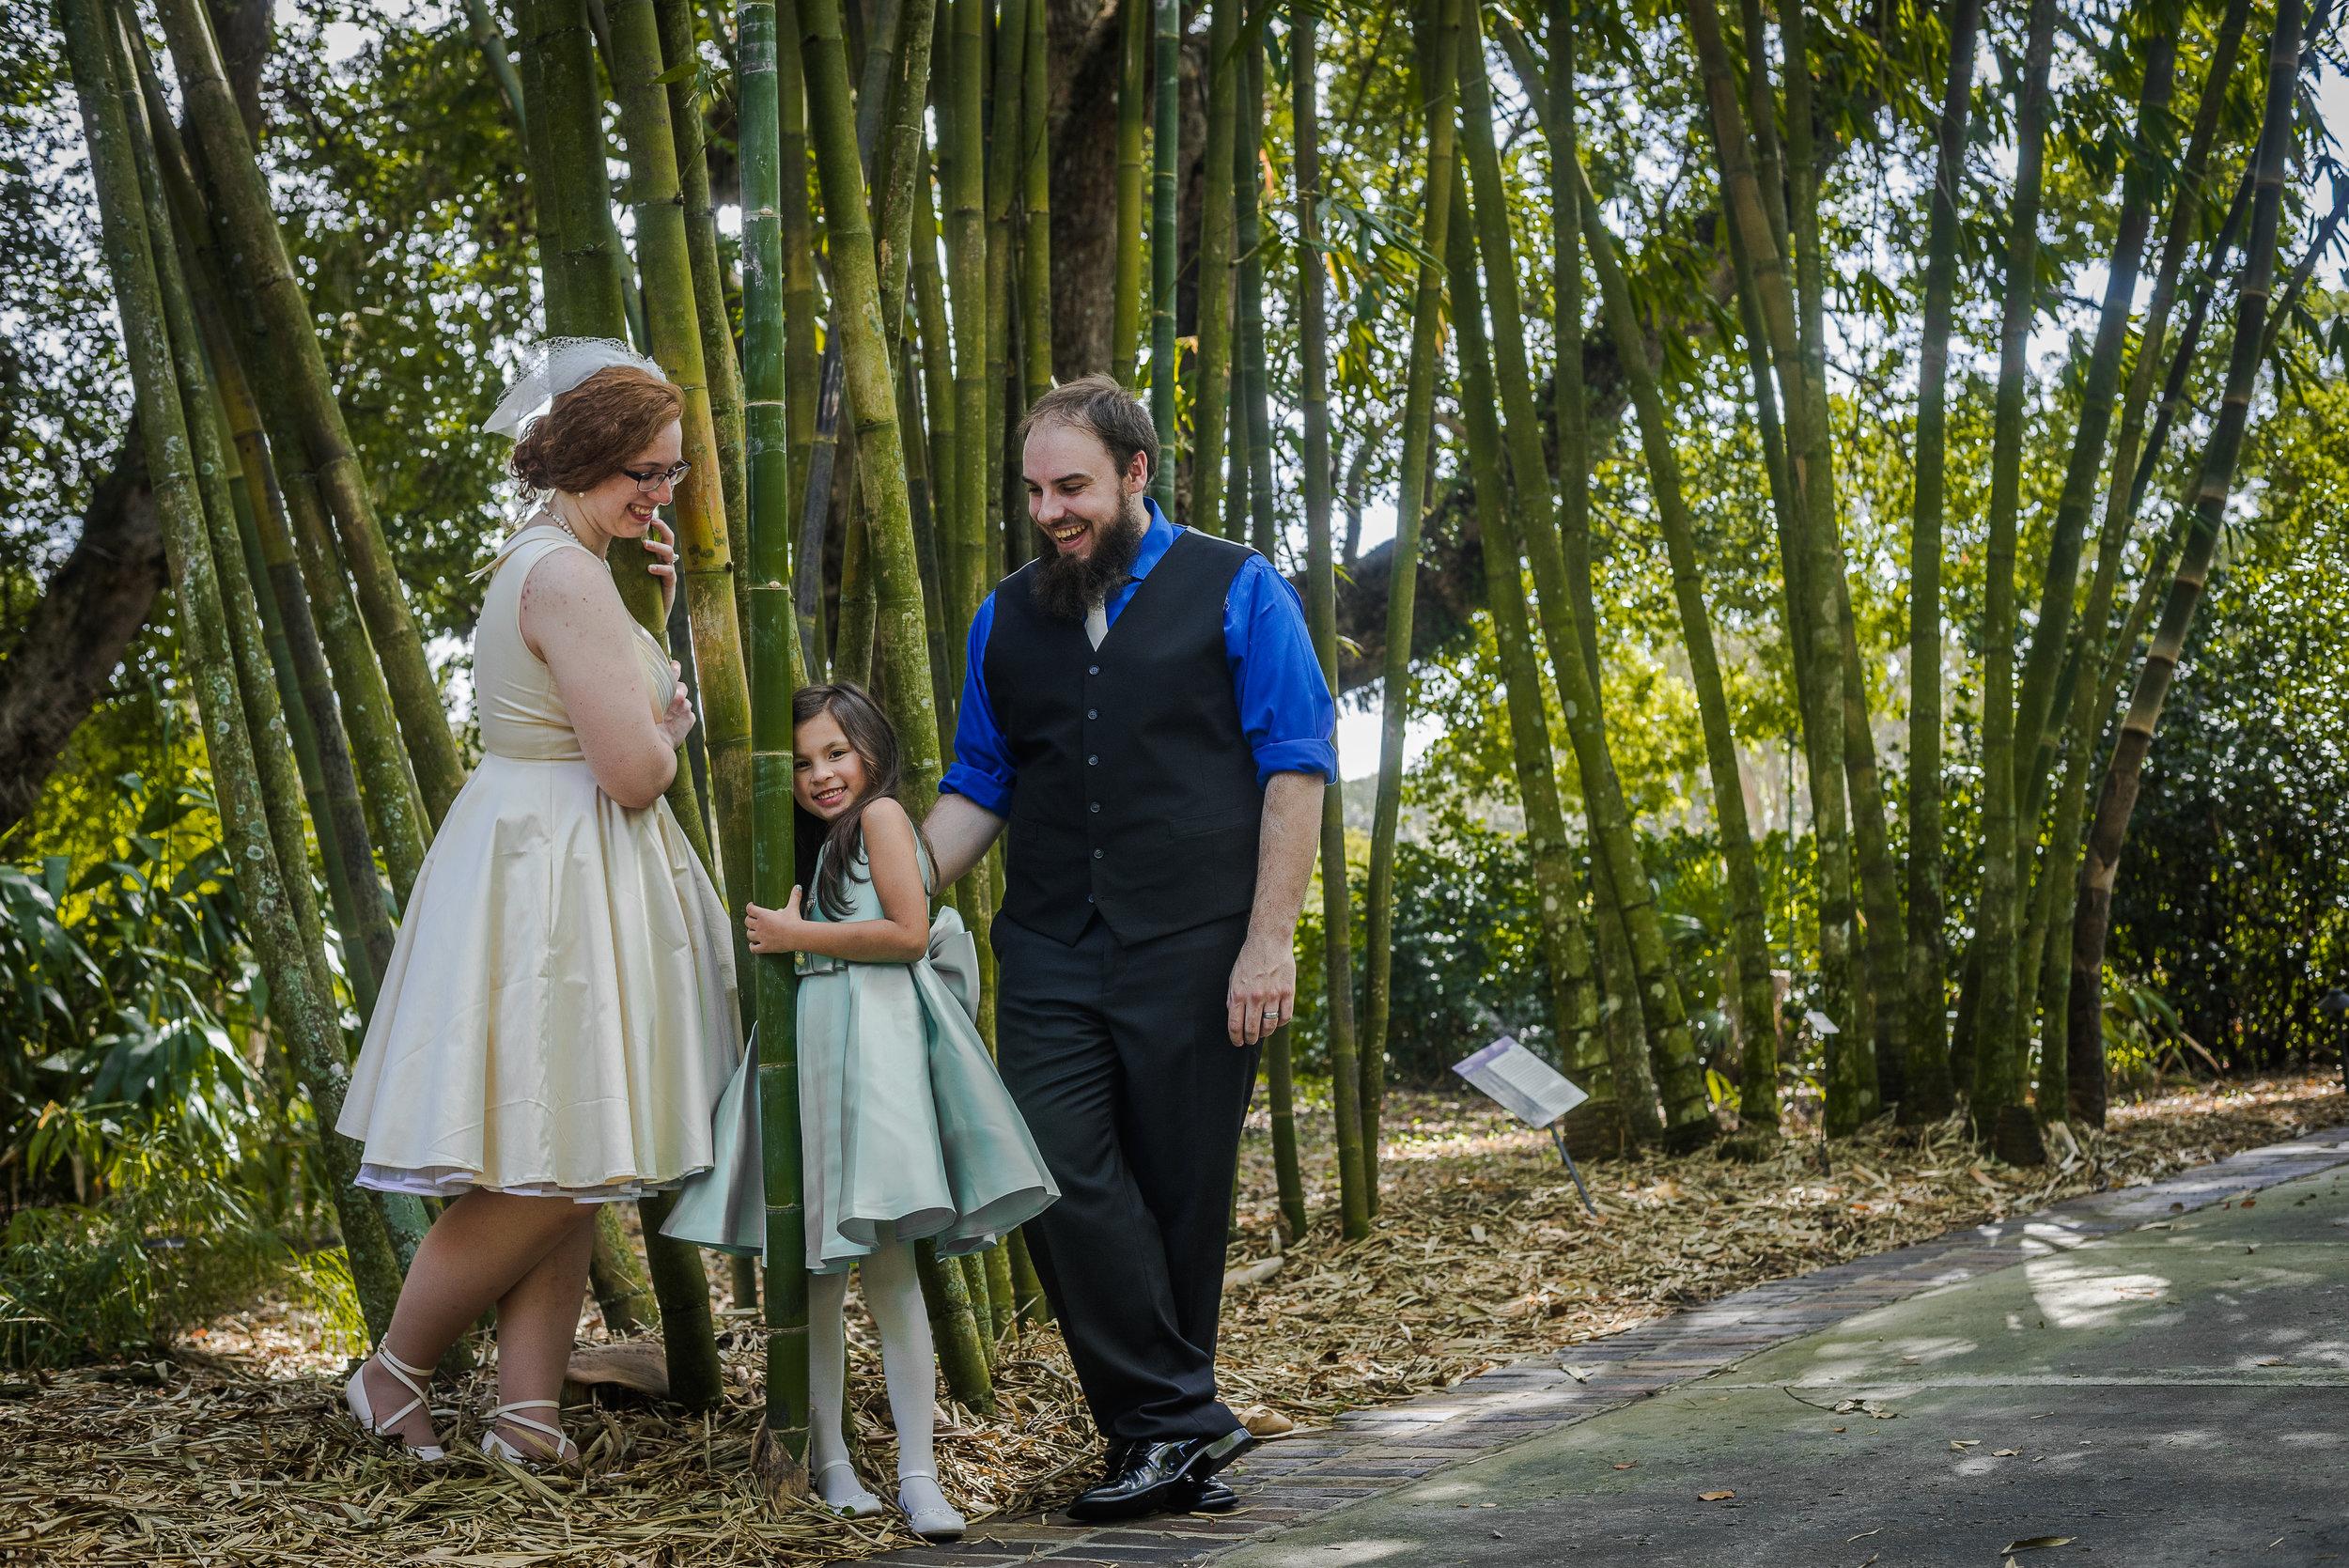 herry-garden-wedding-1-10.jpg